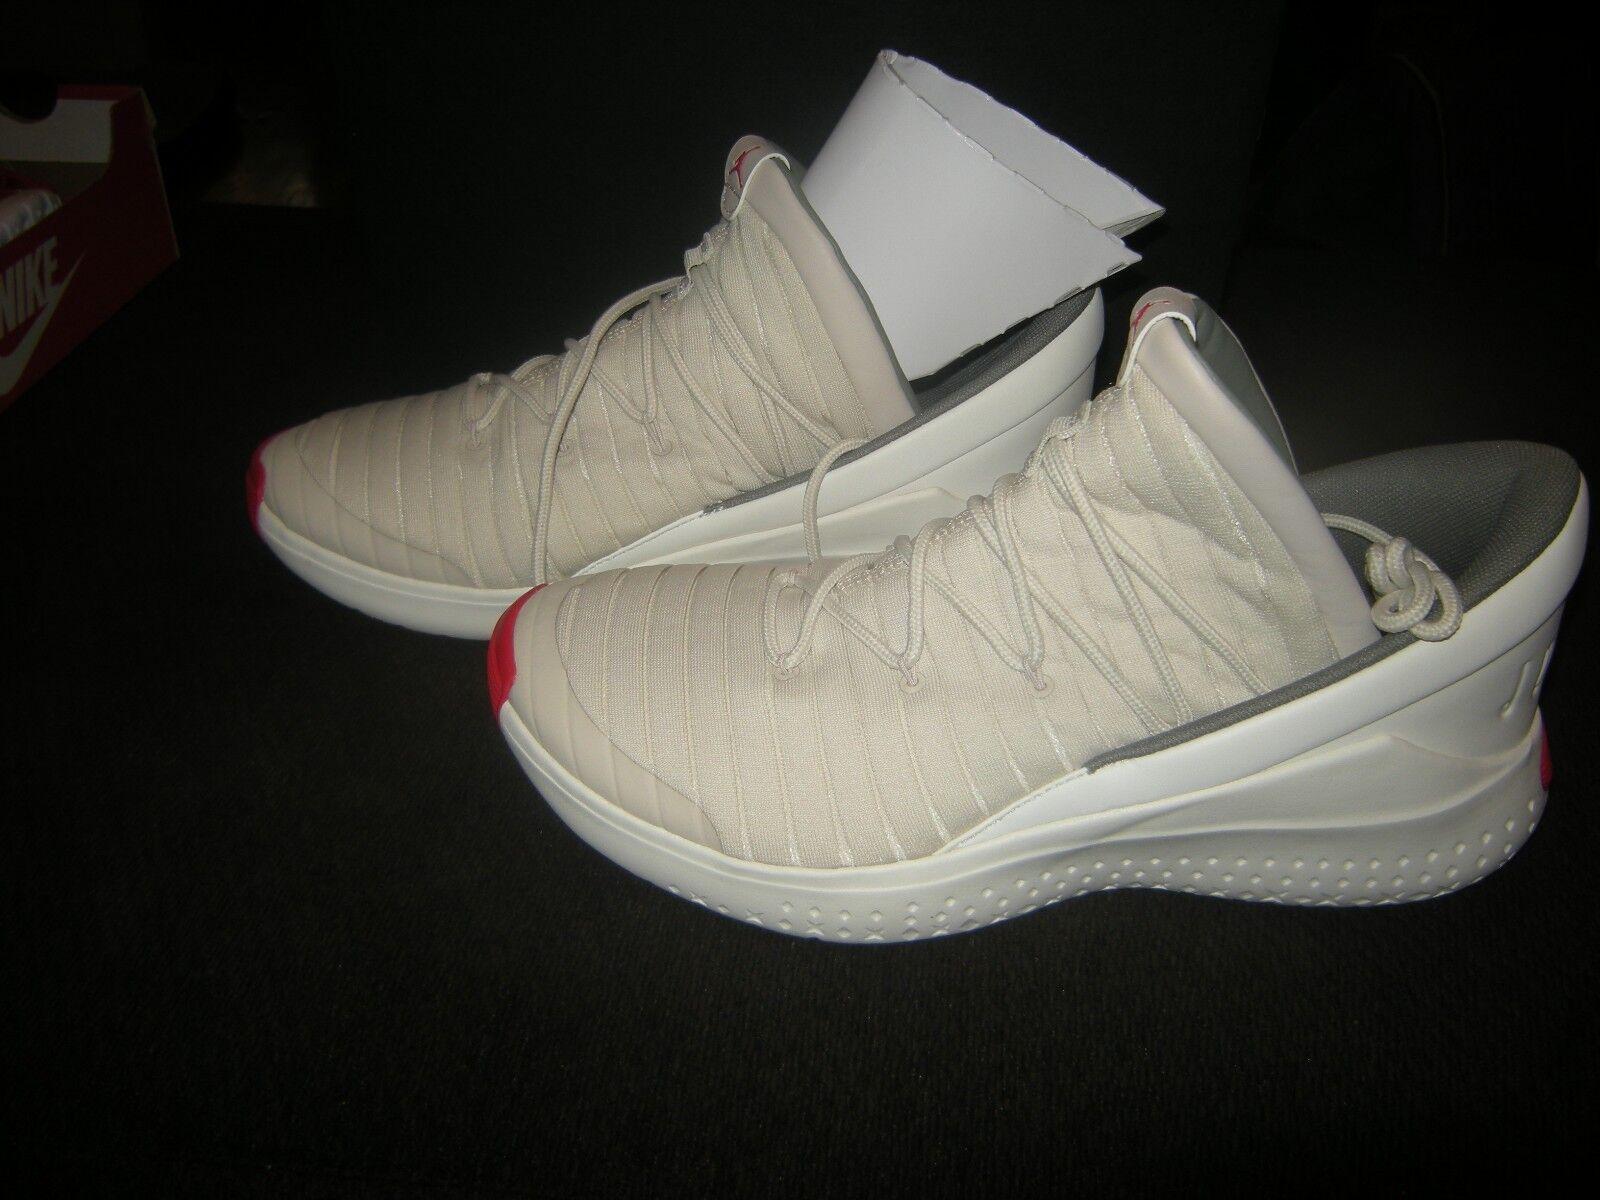 Brand New Mens Off White Nike Jordan Flight Luxe Tennis Shoes, 10.5